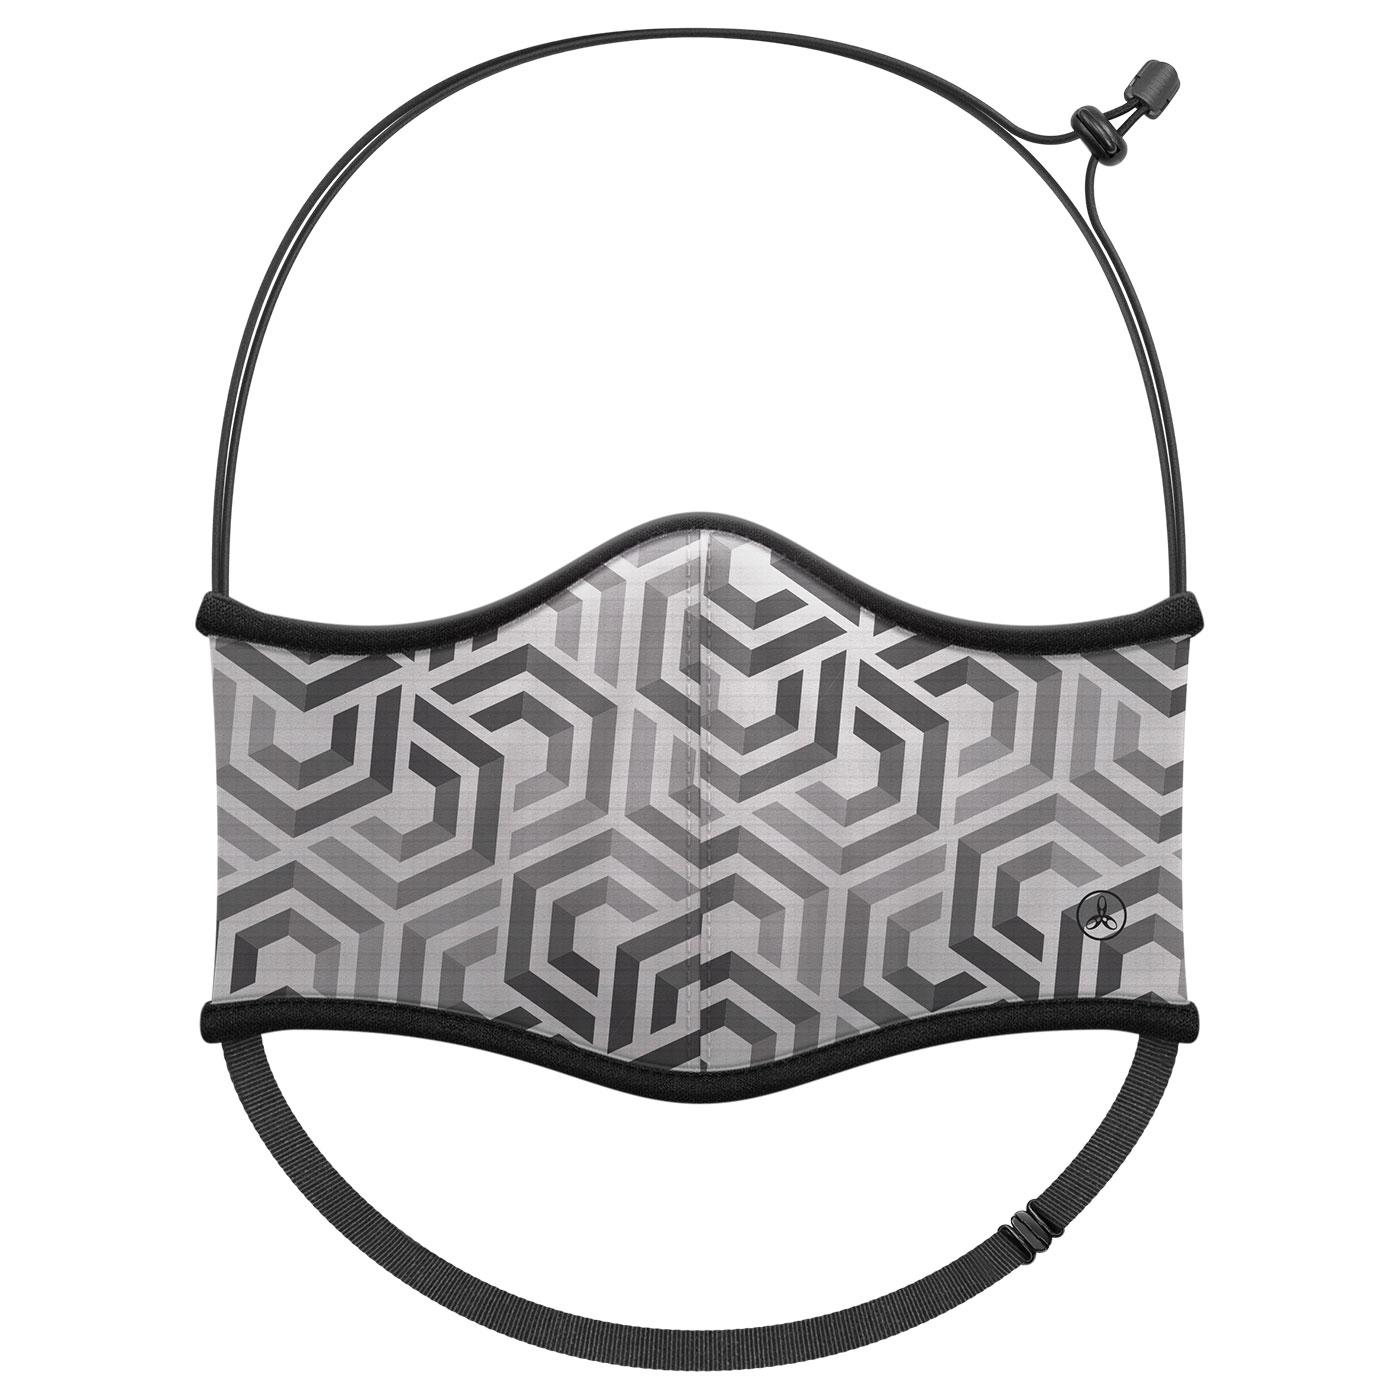 HODARLA 運動舒適口罩6032237 - 白黑淺棕